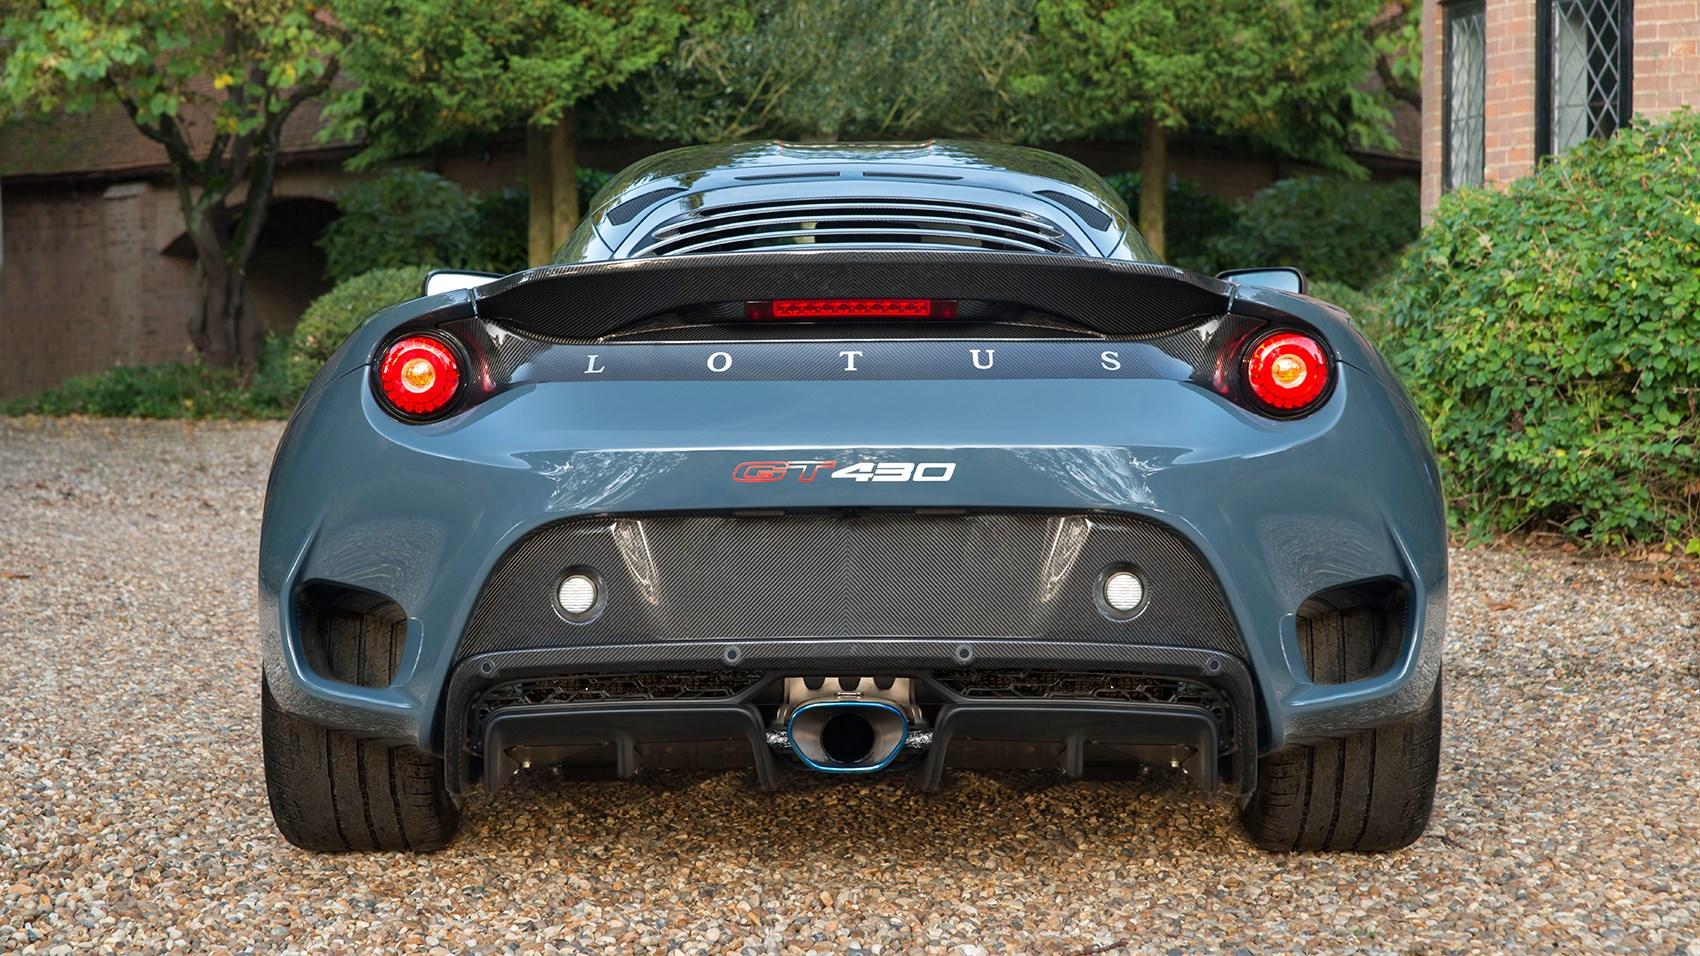 Ben arrivata Evora GT430 Sport Lotus-evora-gt430-14